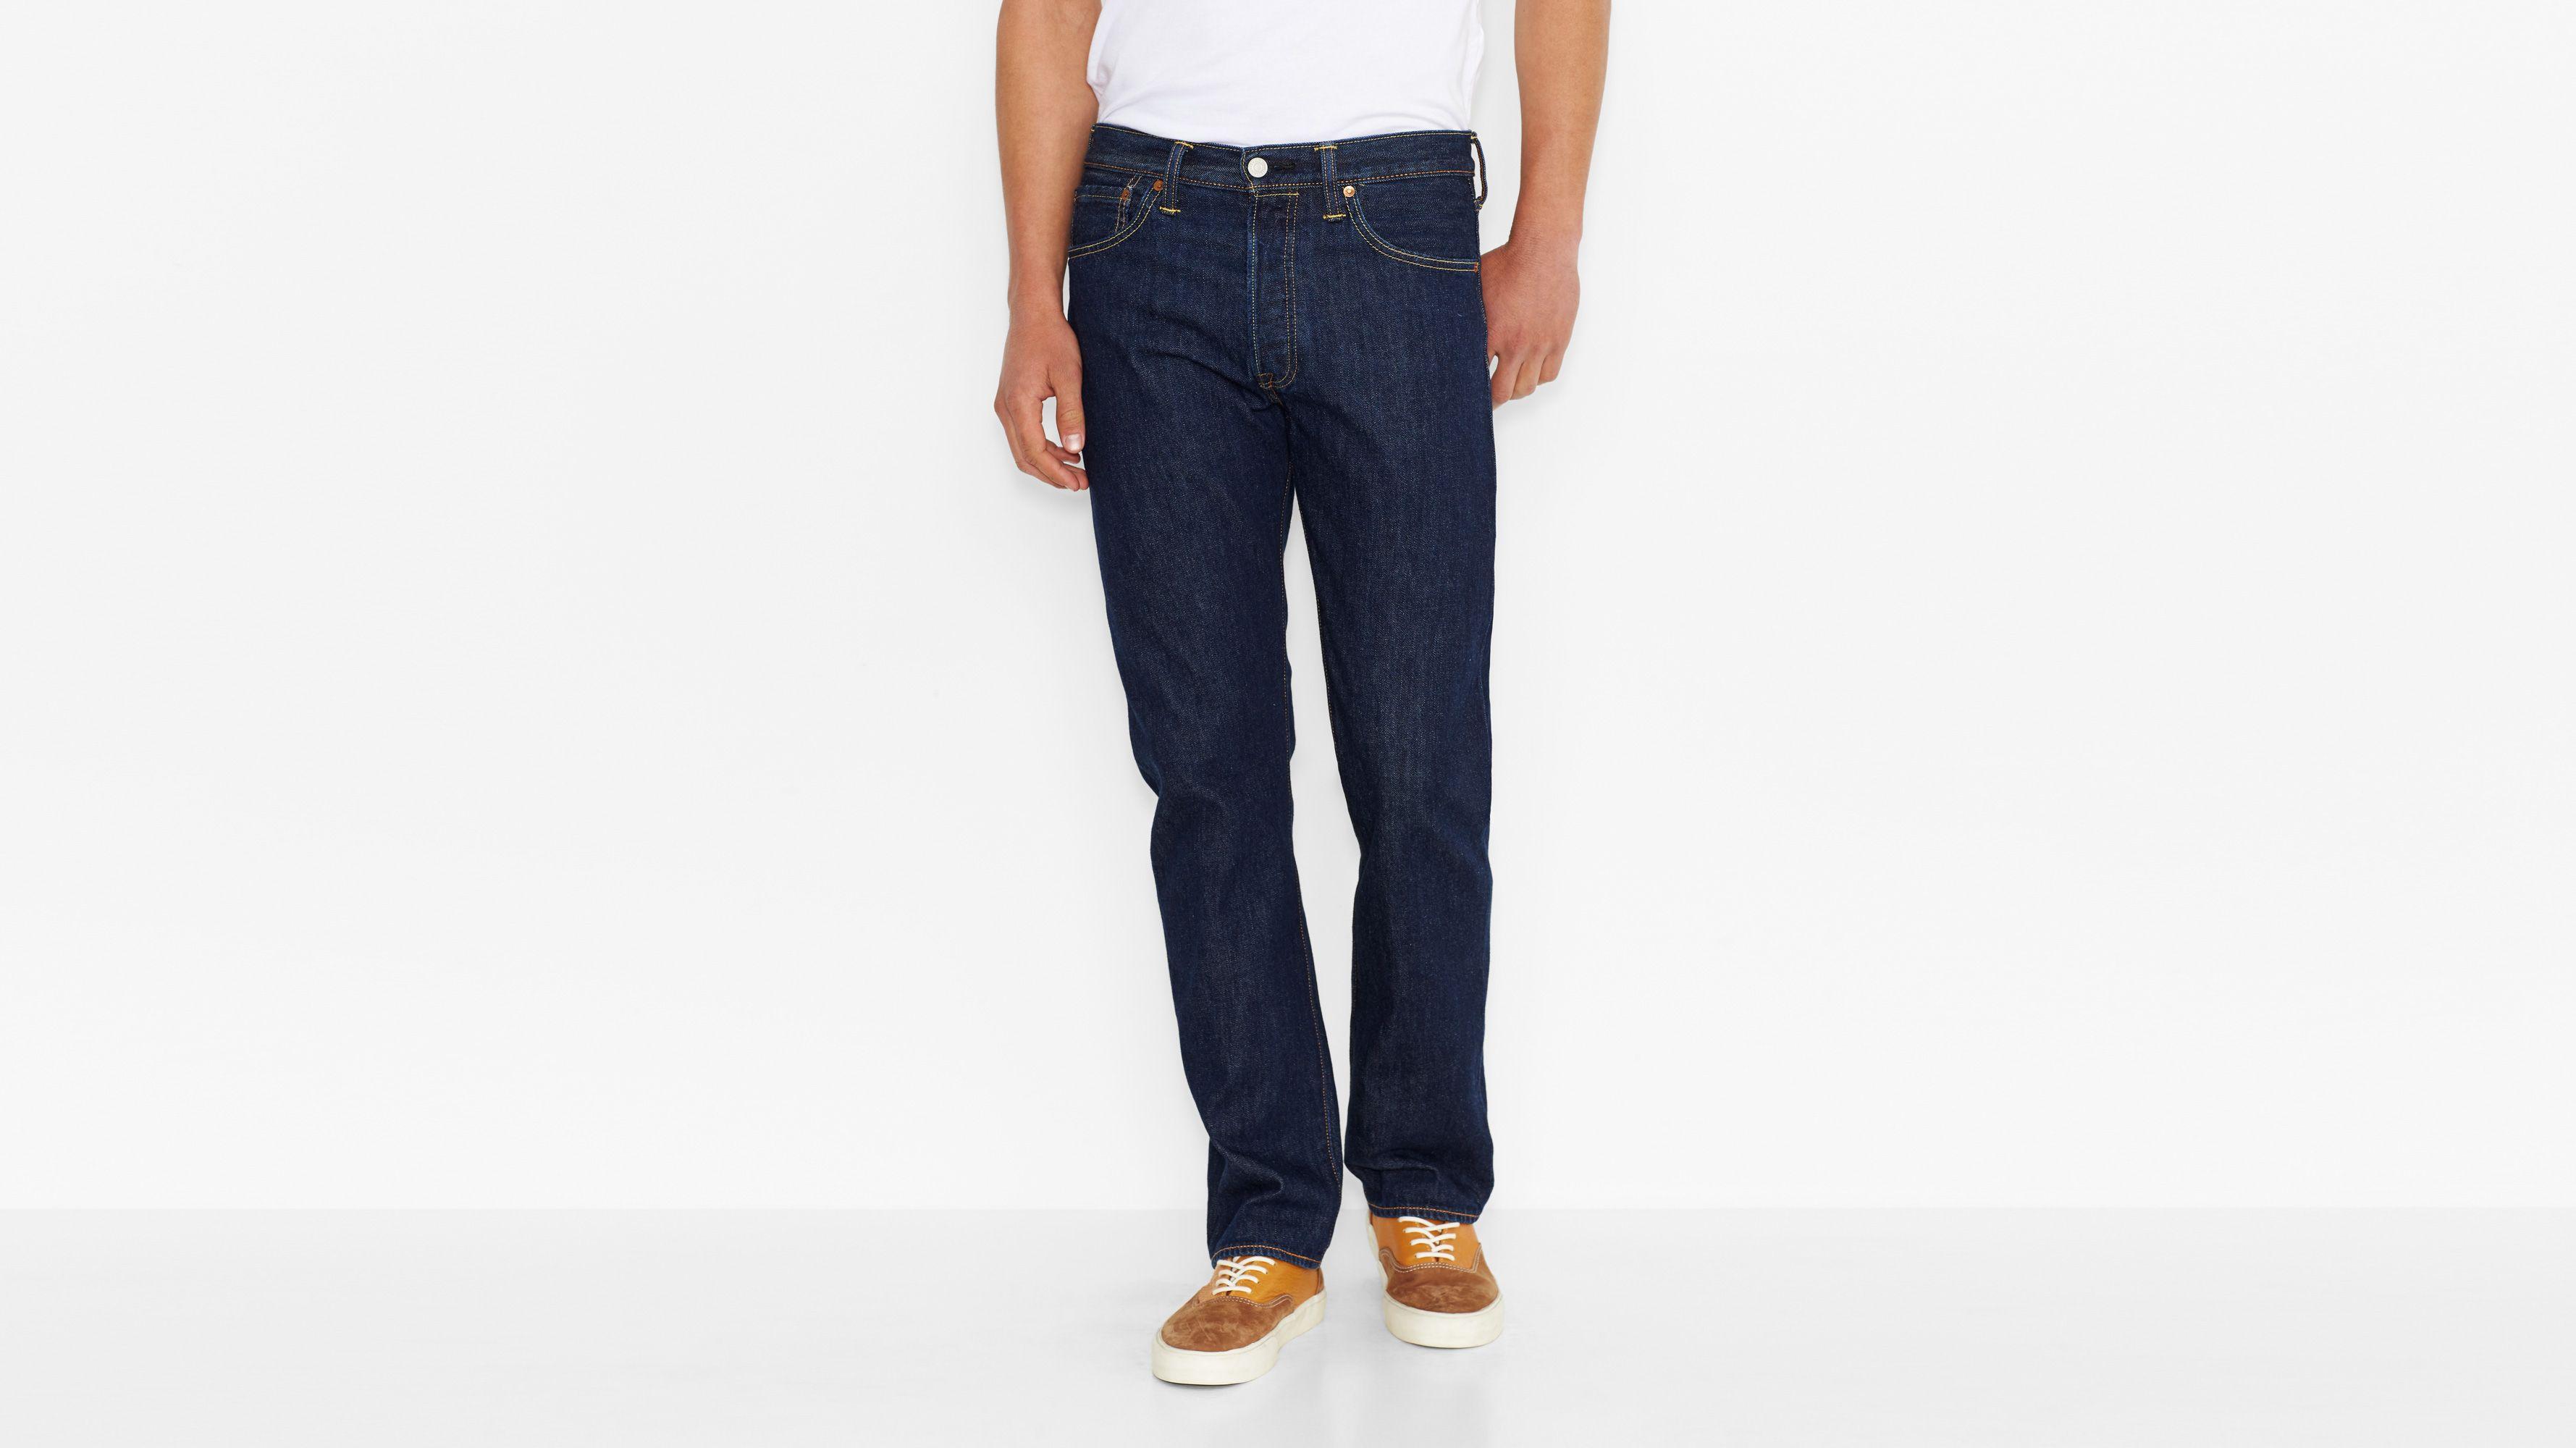 Levi/'s Jeans Hose Chino 501 Regular Original Blau 501-2916 Baumwolle